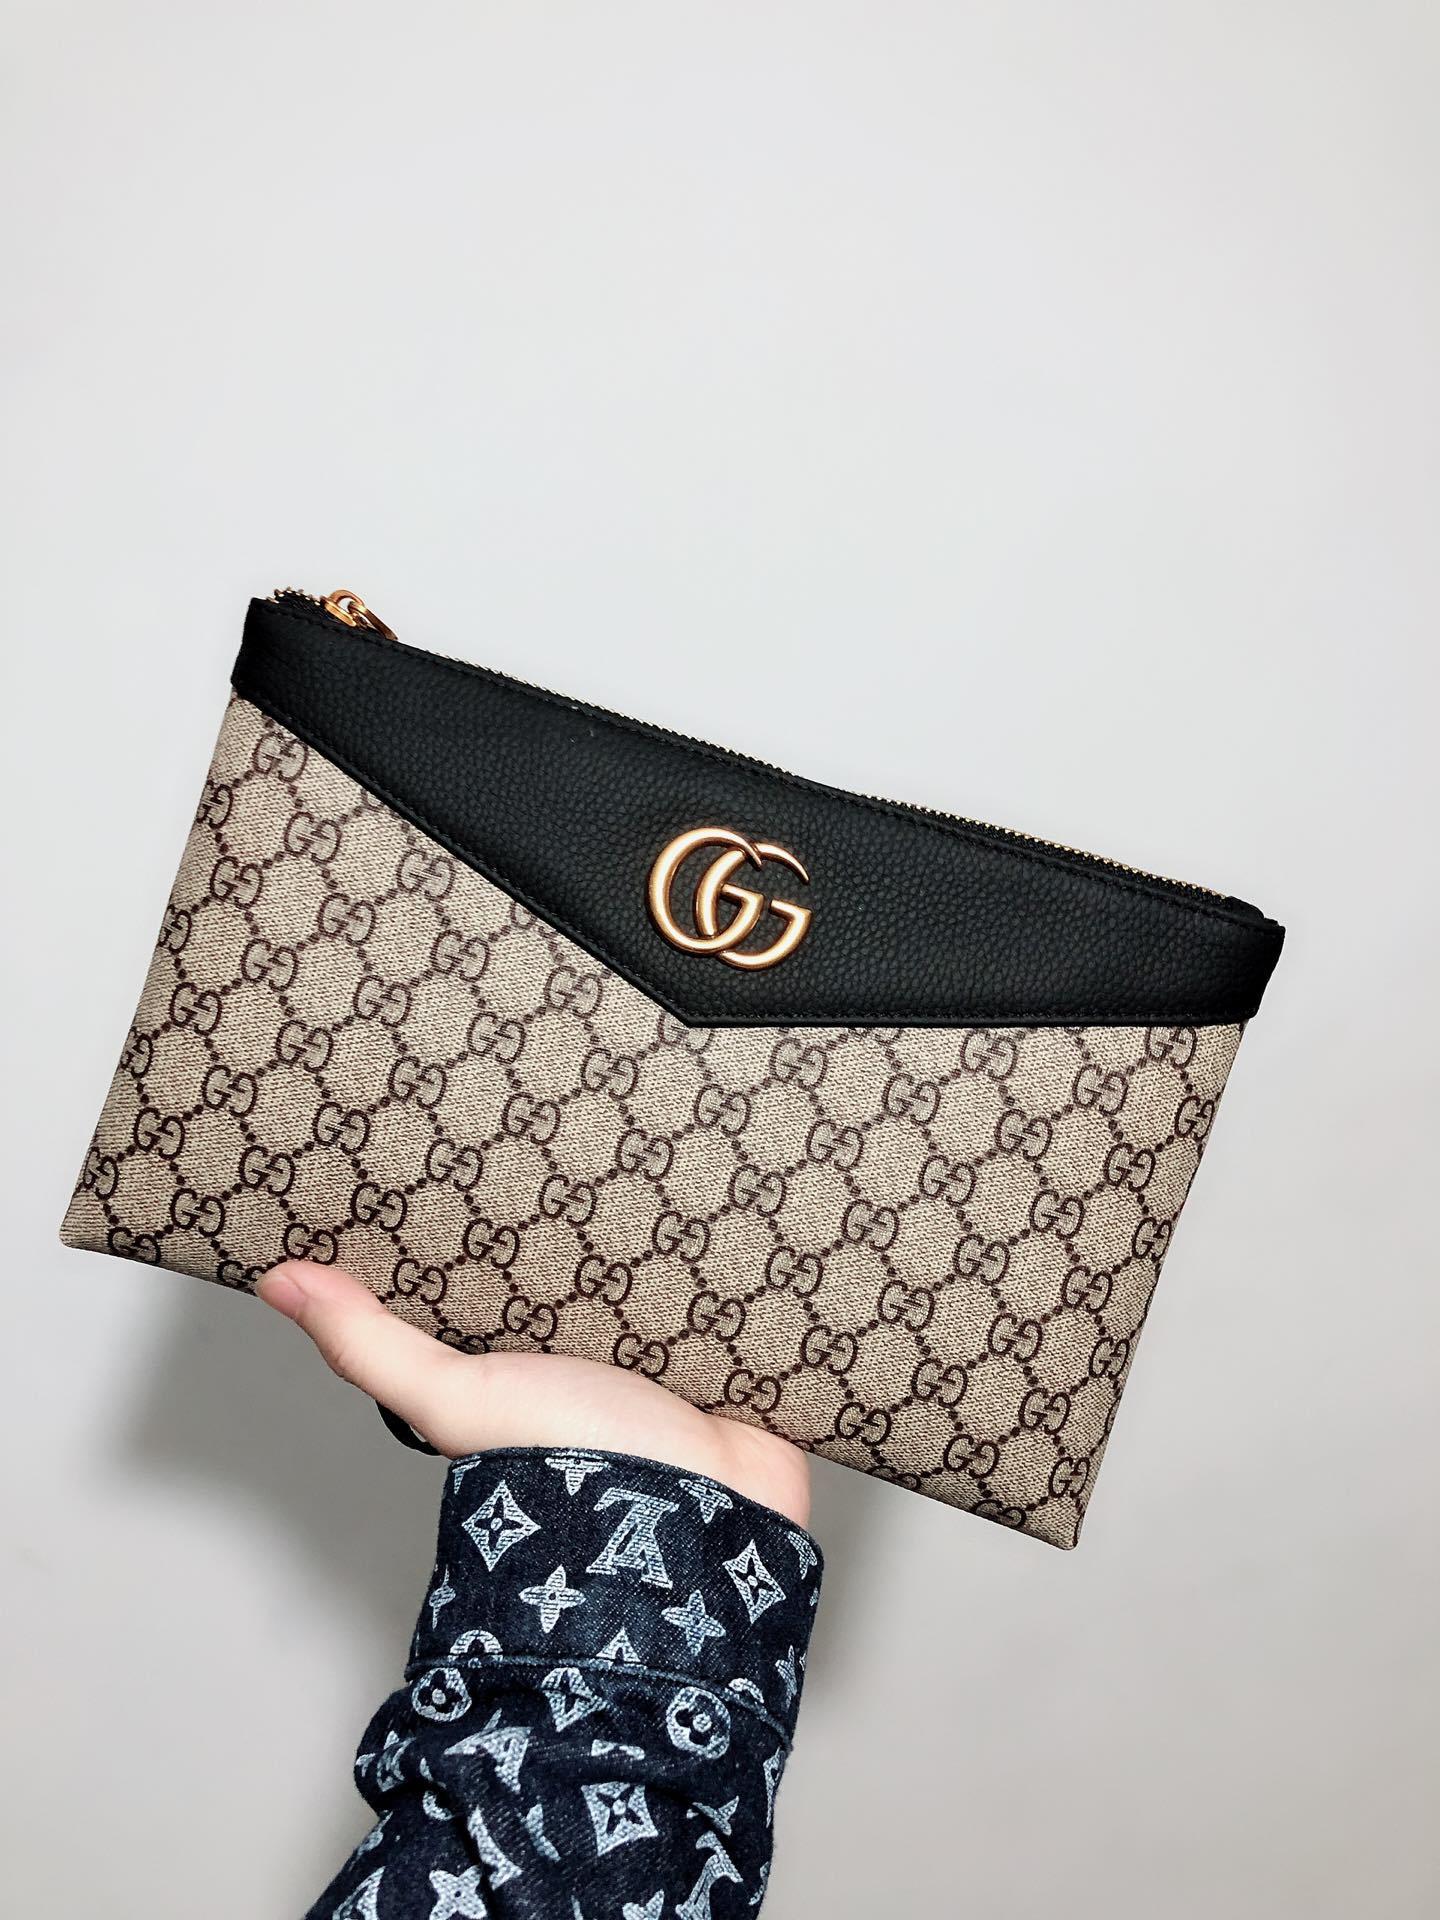 Gucci グッチ メンズ クラッチバッグ おすすめ 安全サイト 商品専門店 2346